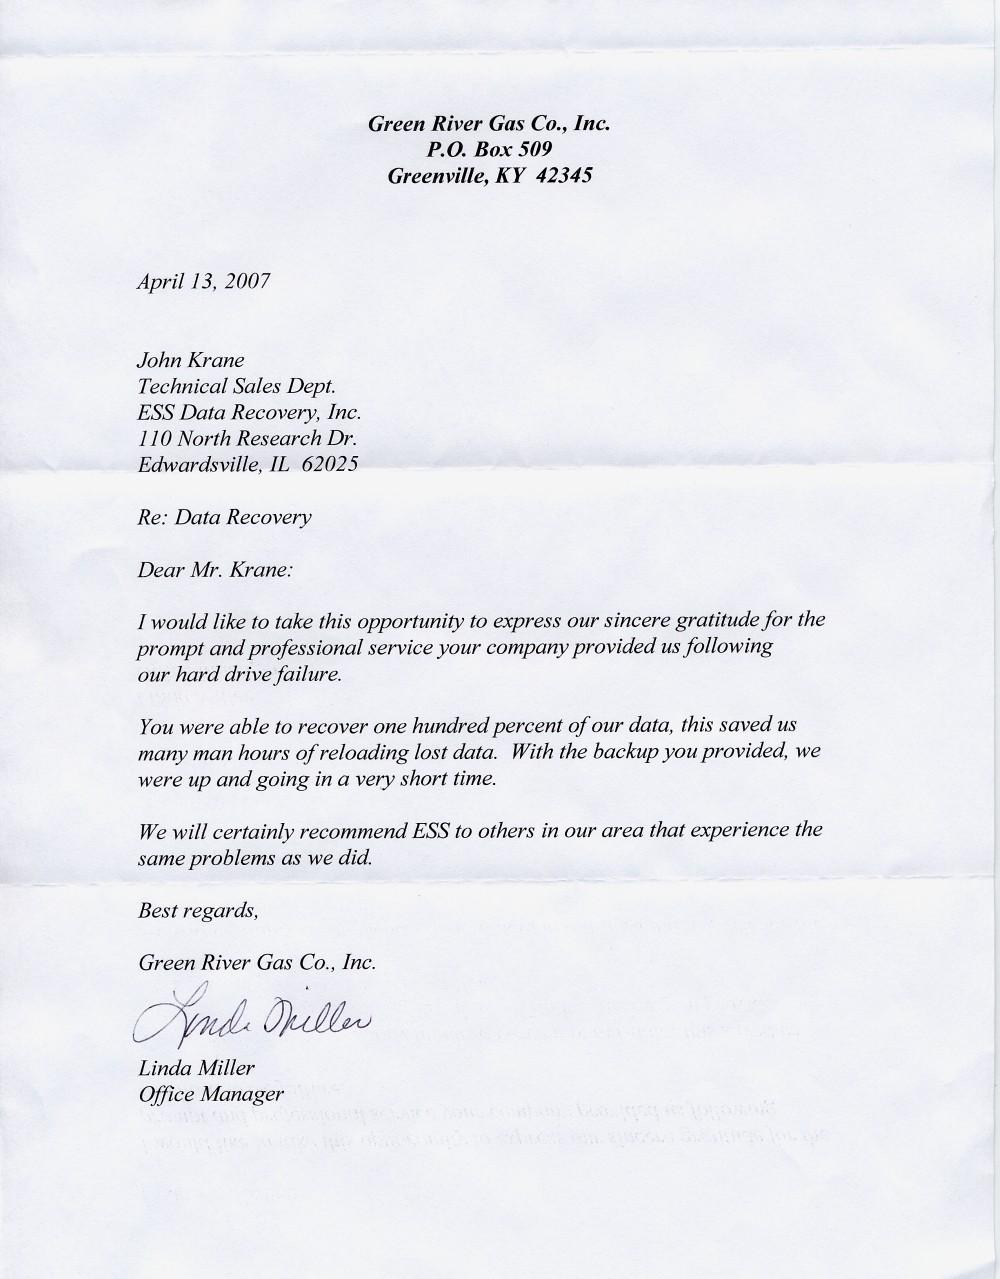 Green River Gas Co., Inc. testimonial